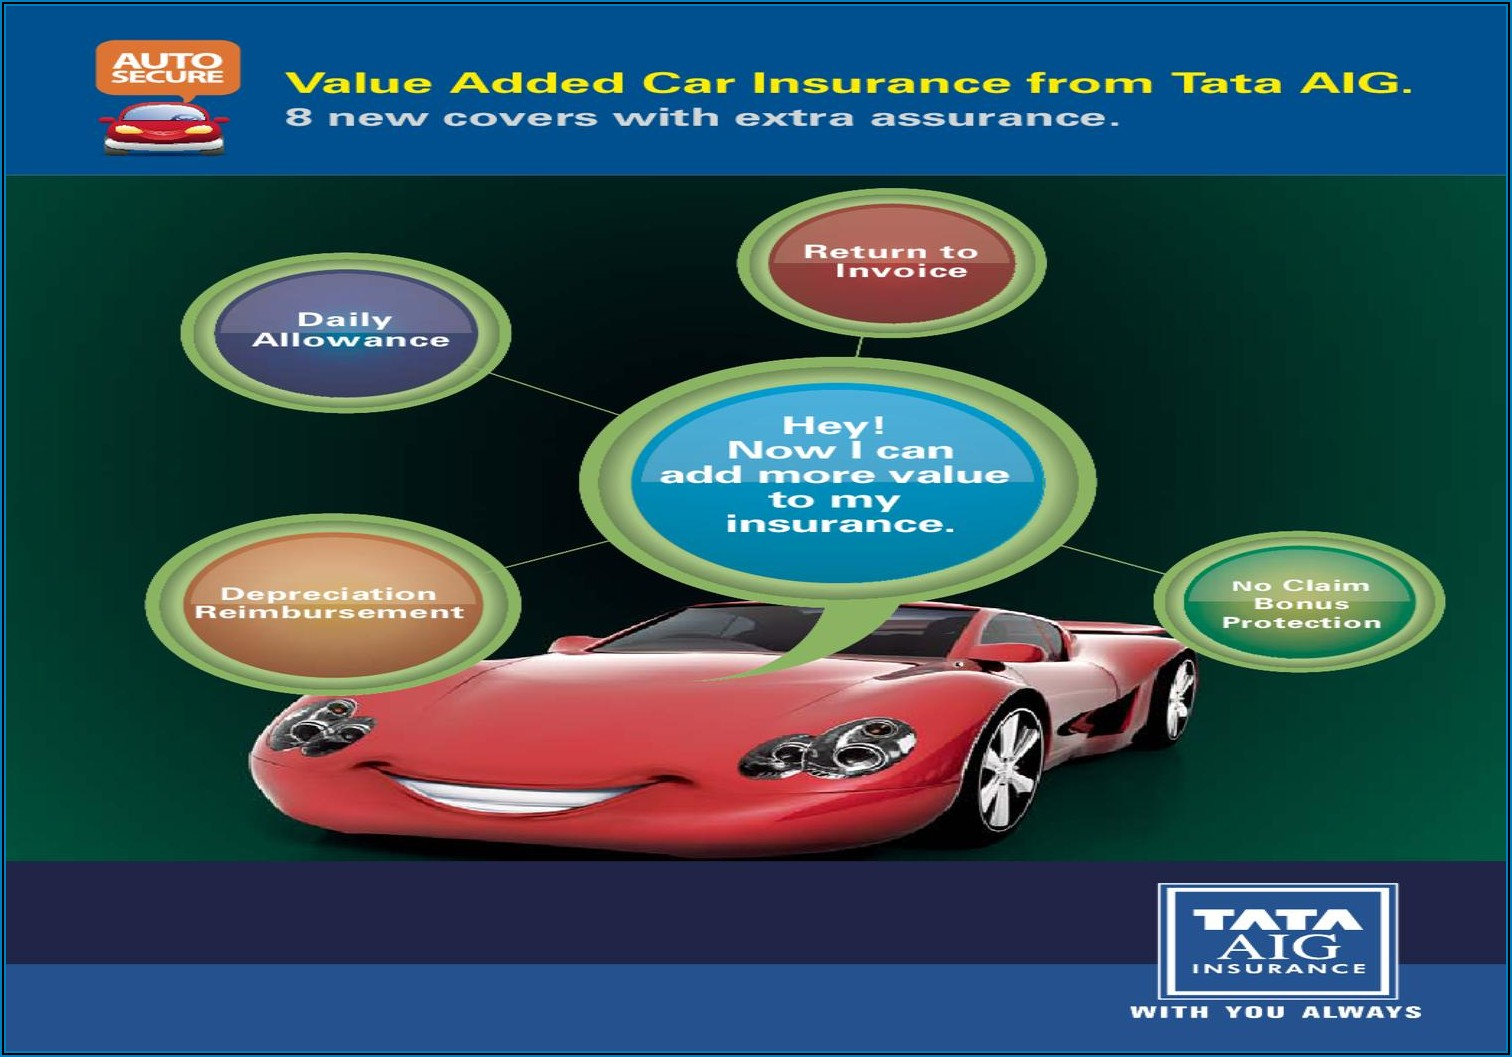 Tata Aig Student Travel Insurance Brochure